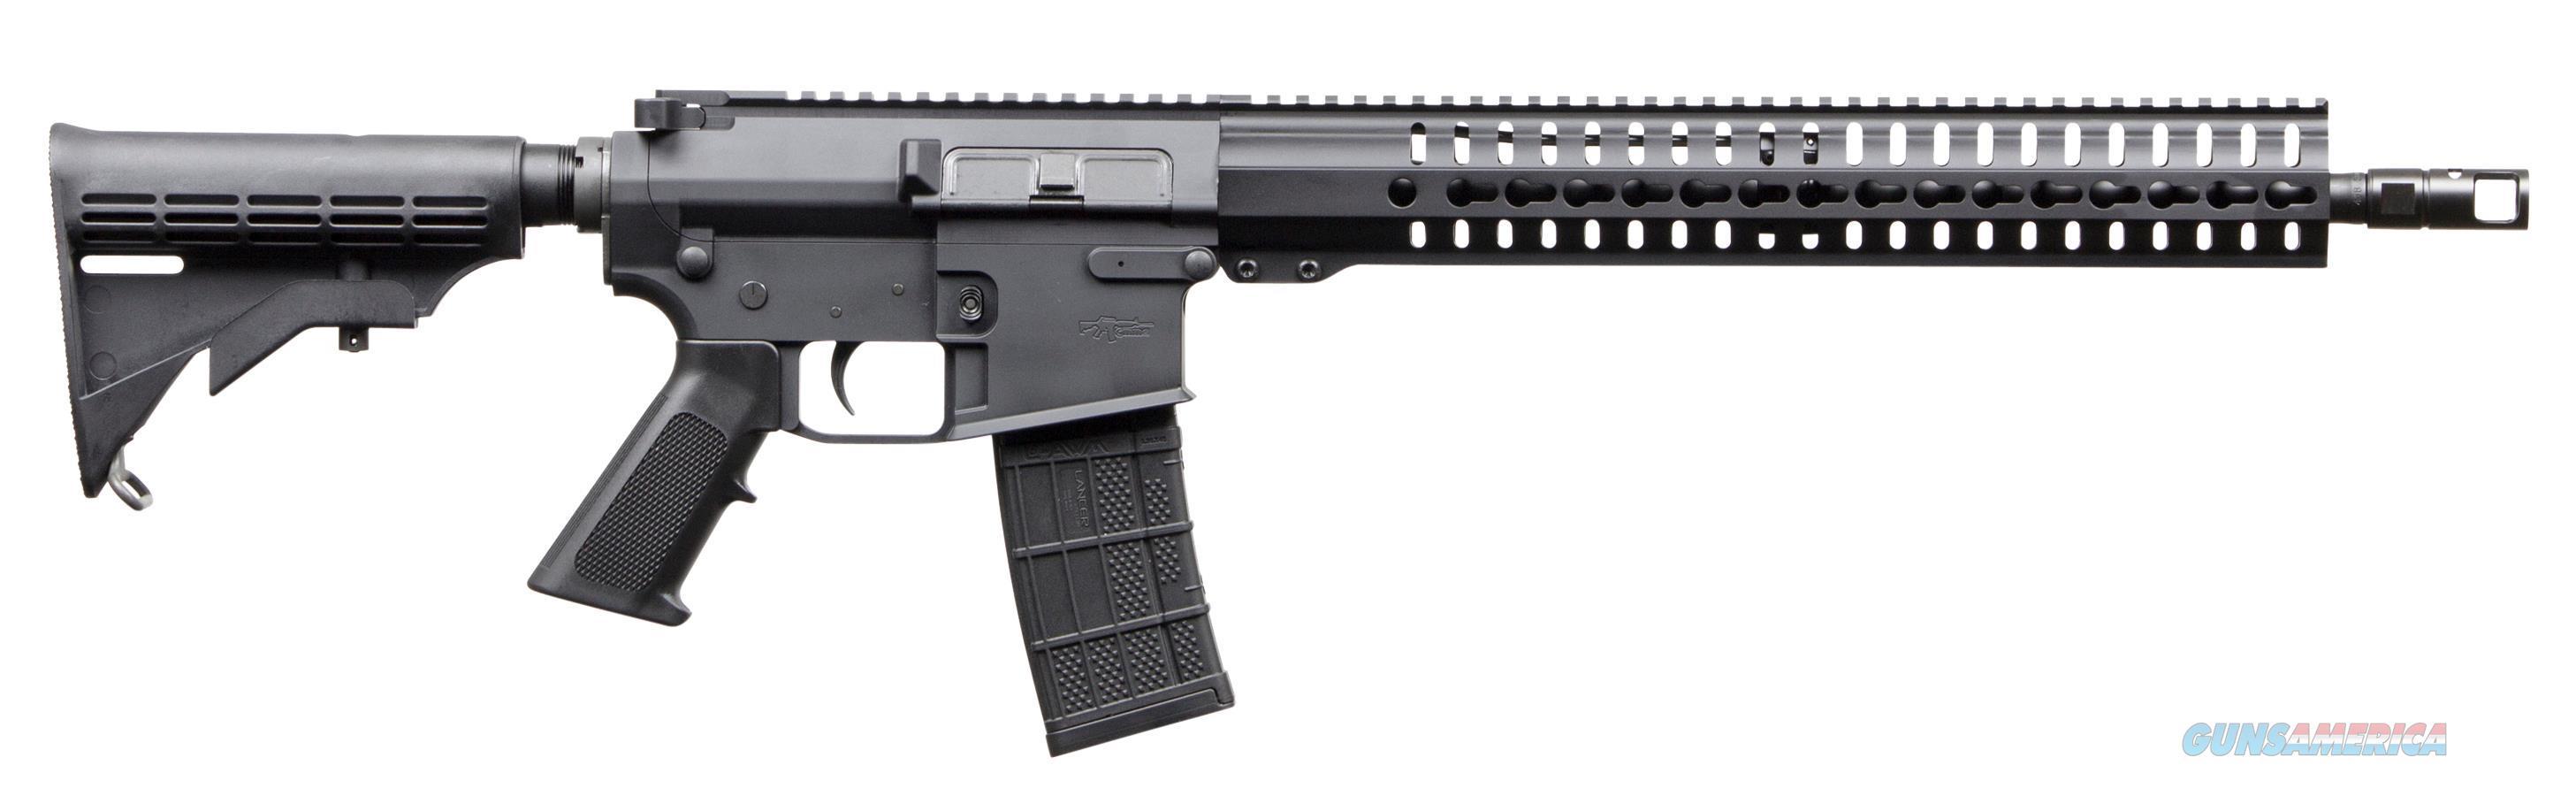 "Cmmg 48A7aaa Mkw-15 Xbe2 Semi-Automatic 458 Socom 16.1"" 30+1 6-Position Blk Stk 48A7AAA  Guns > Rifles > C Misc Rifles"